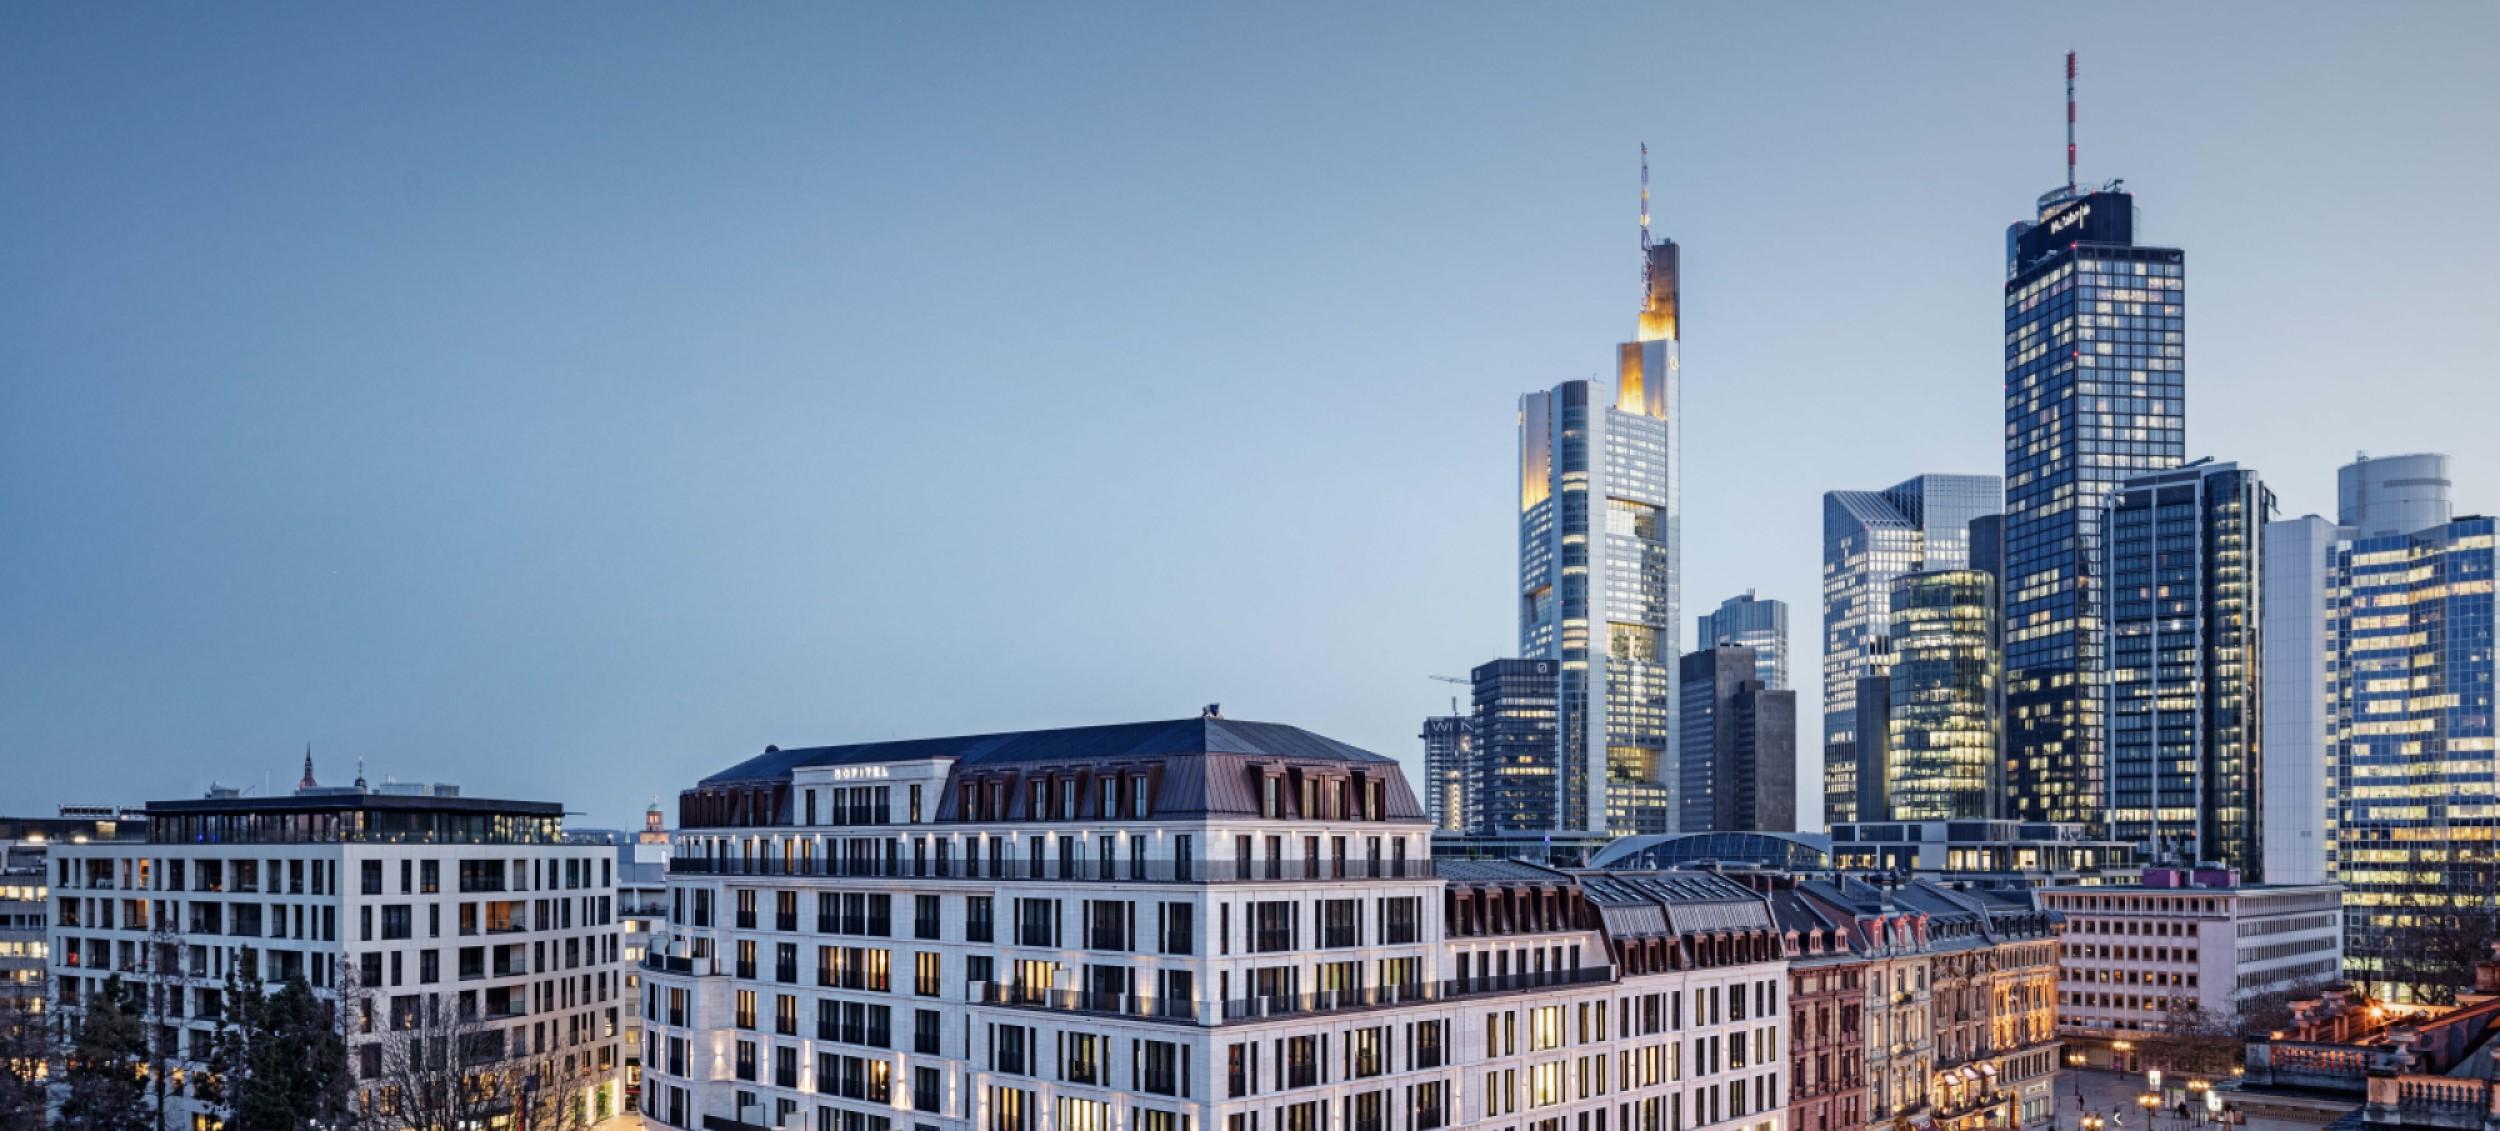 Opernplatz 14 vor der Frankfurter Skyline